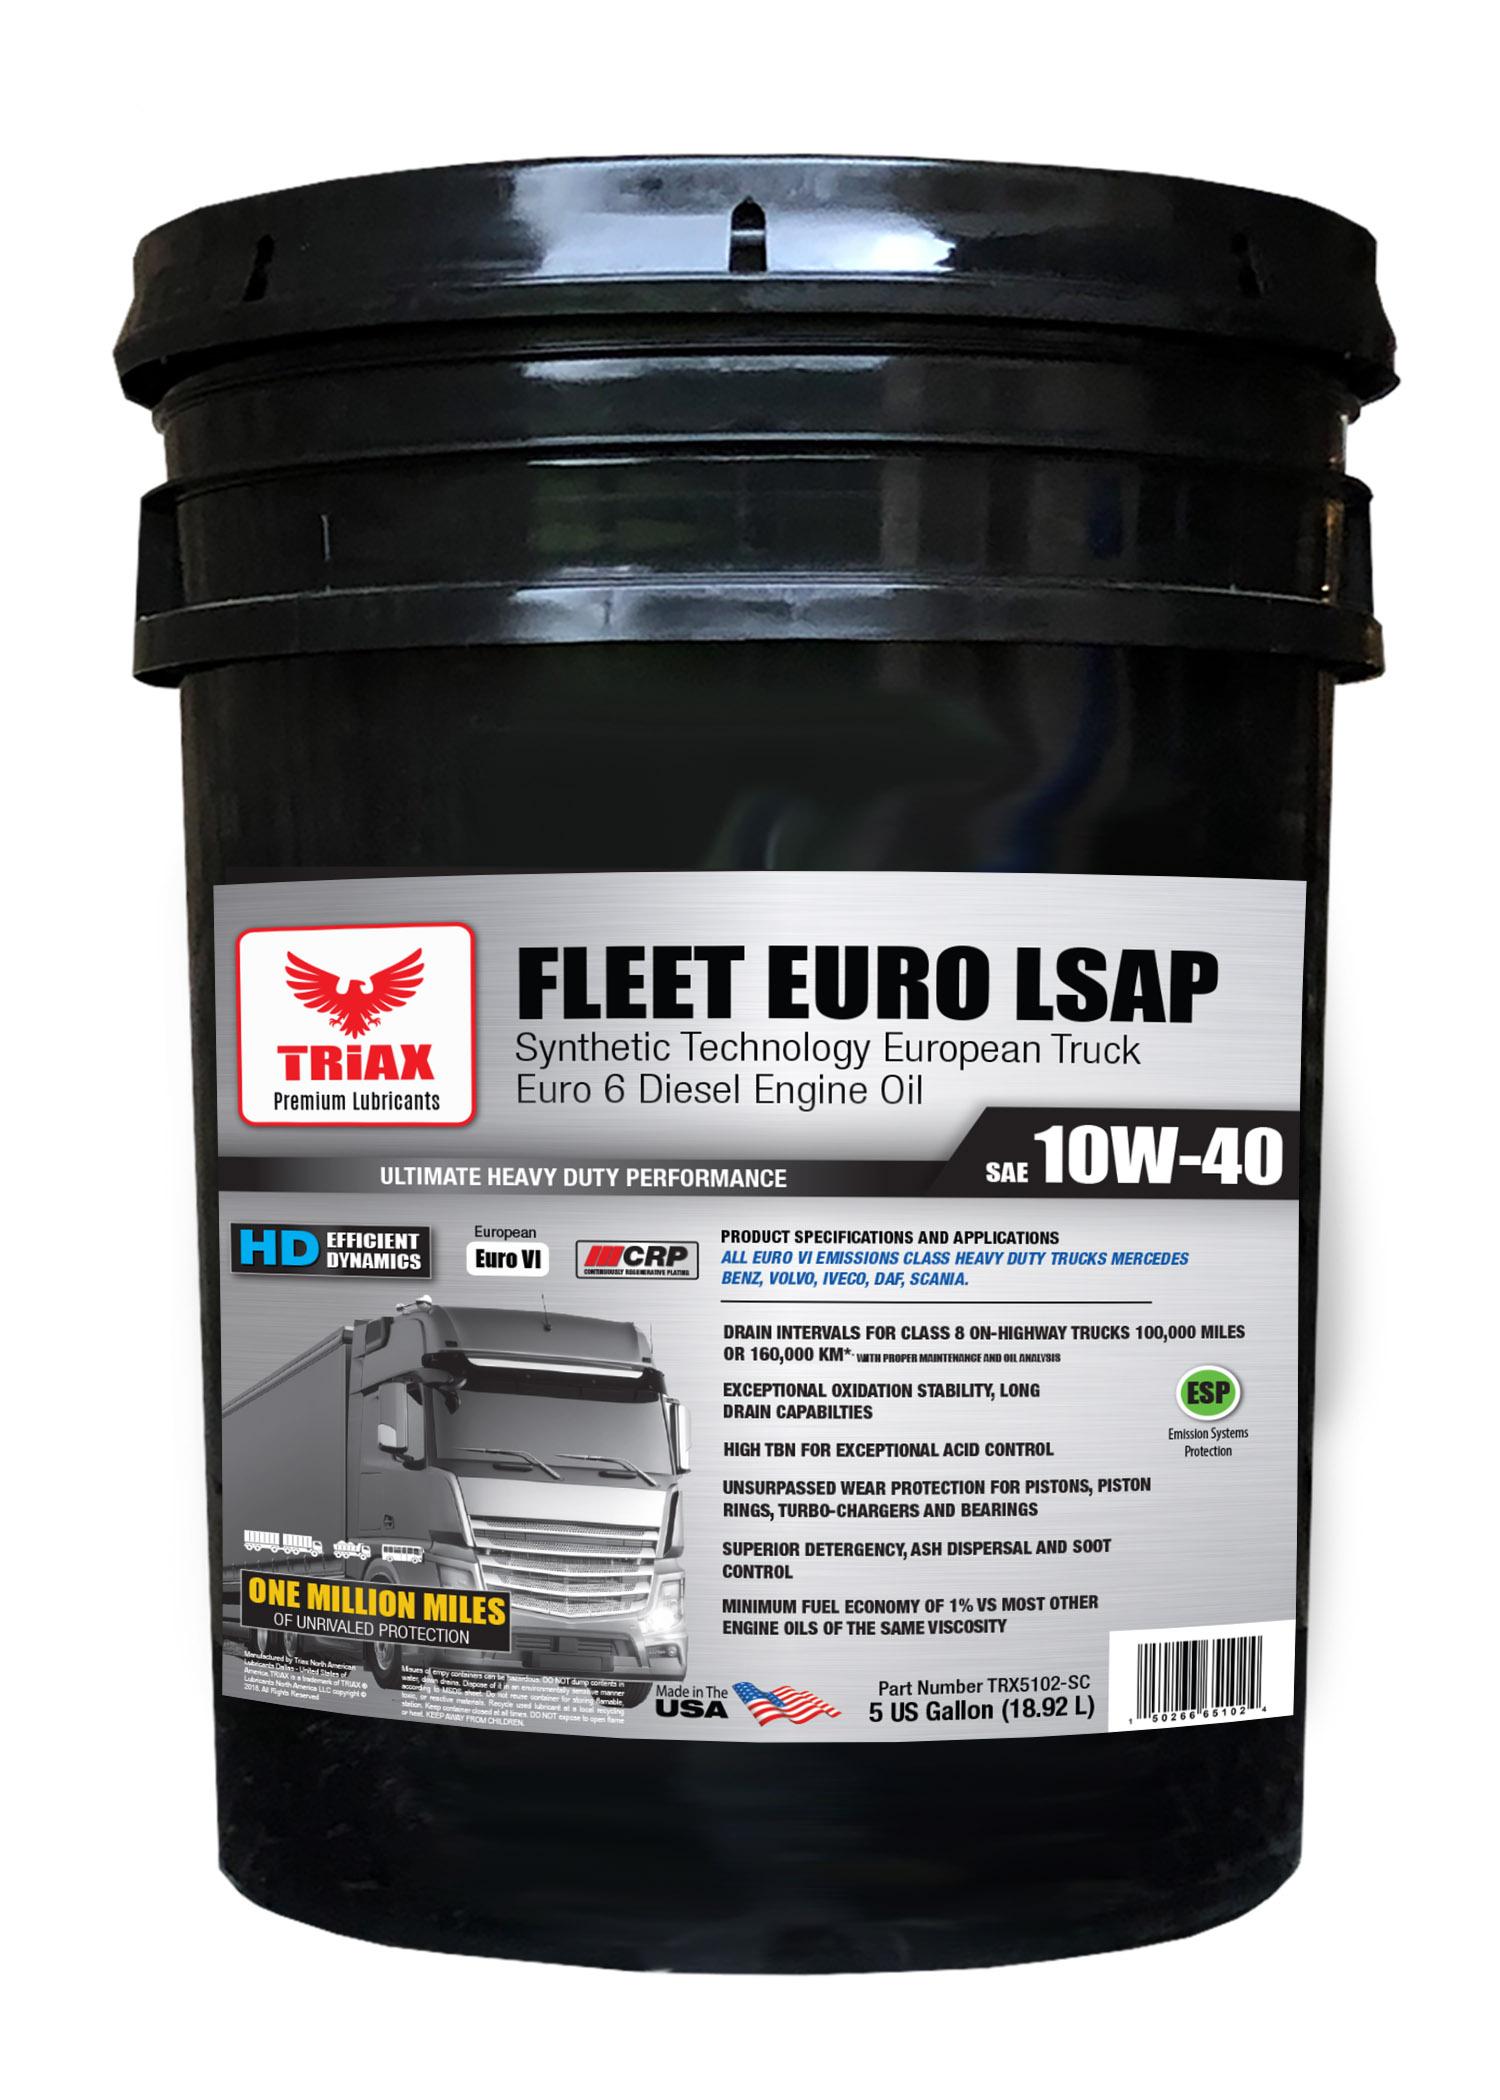 TRIAX Fleet Euro LSAP 10W-40 (Euro 6)